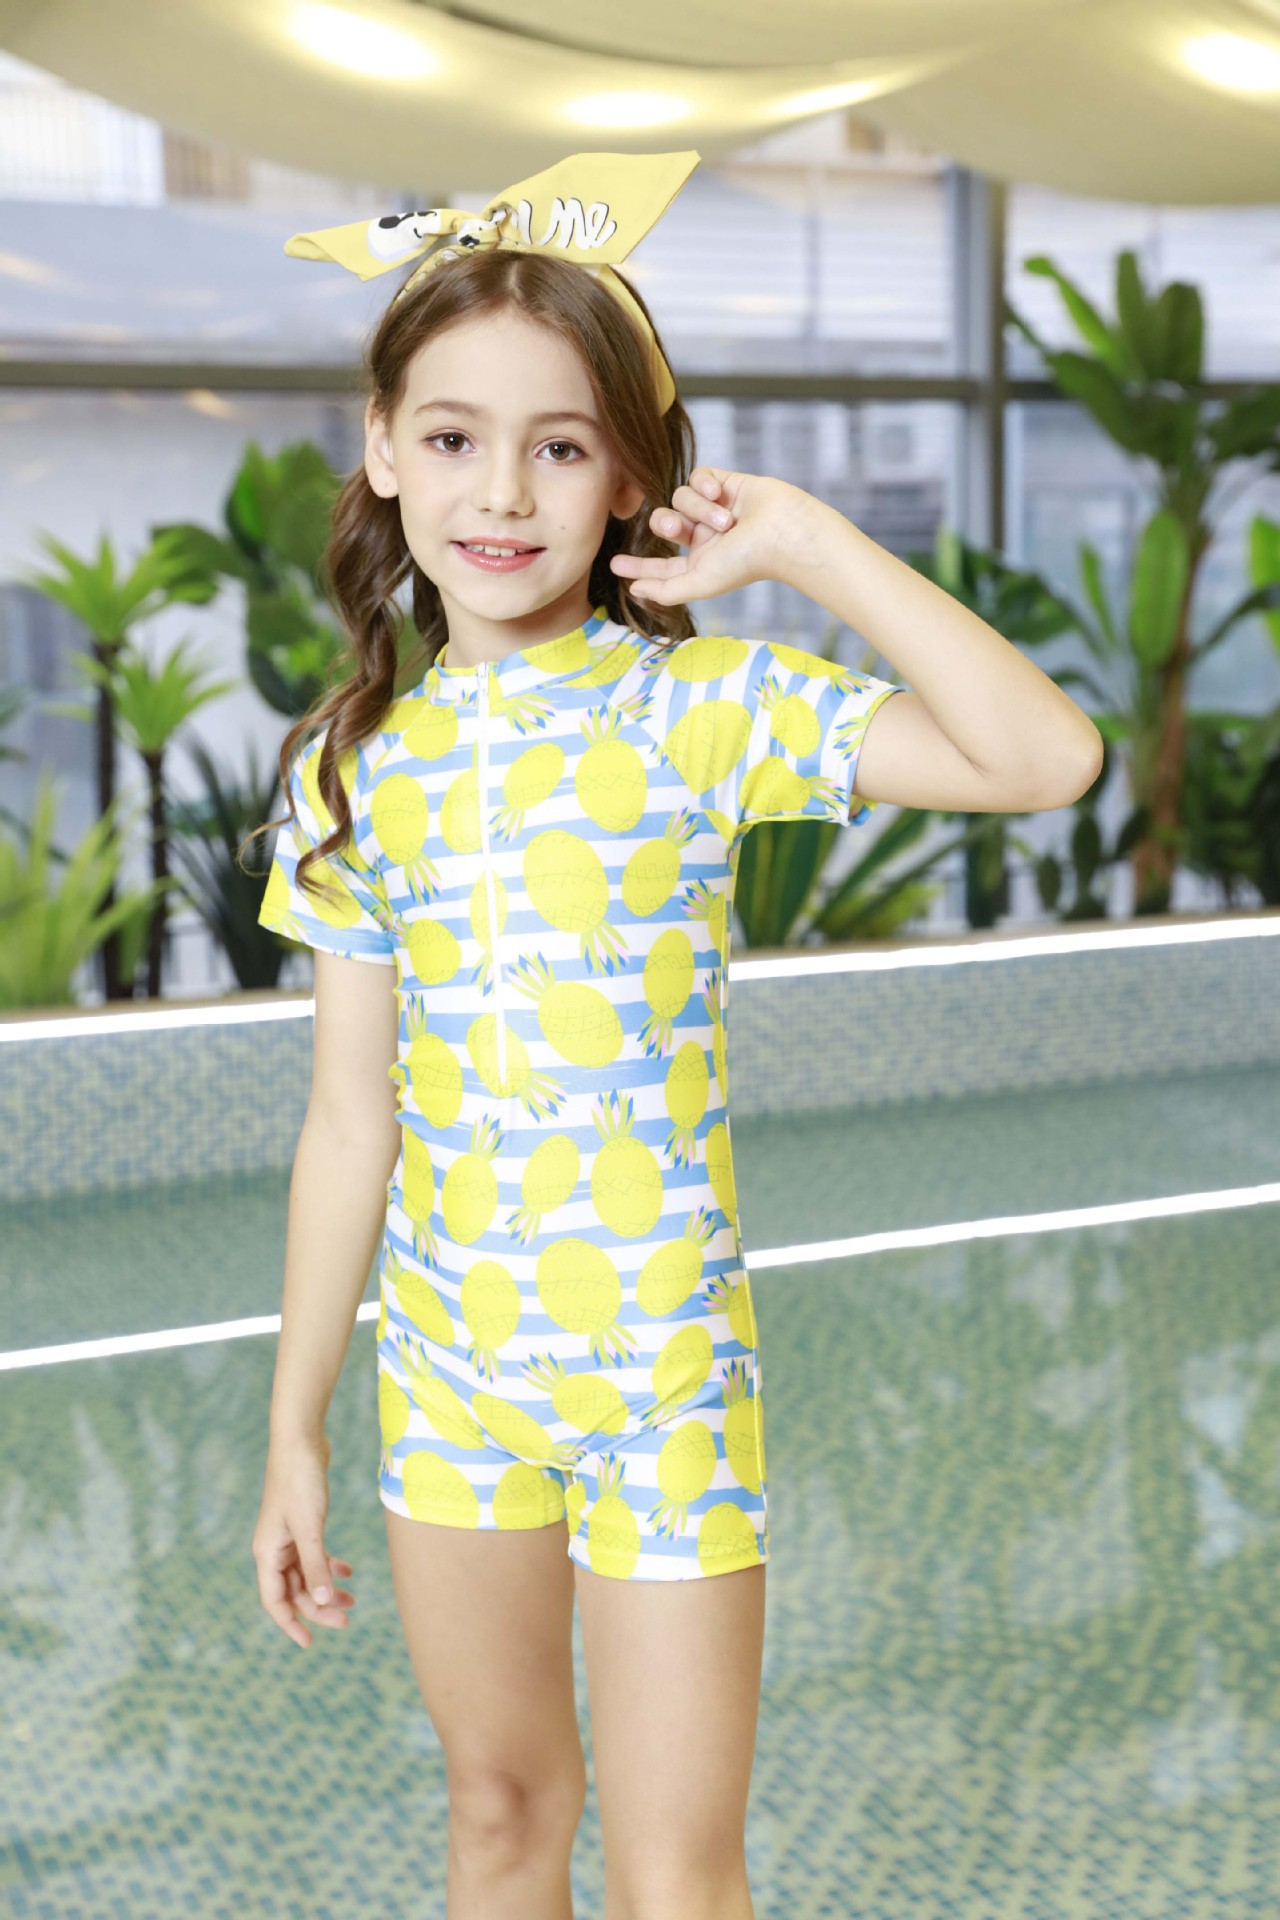 2019 New Style Girls' One-piece Swim Wears Cute Swimming Training Clothing